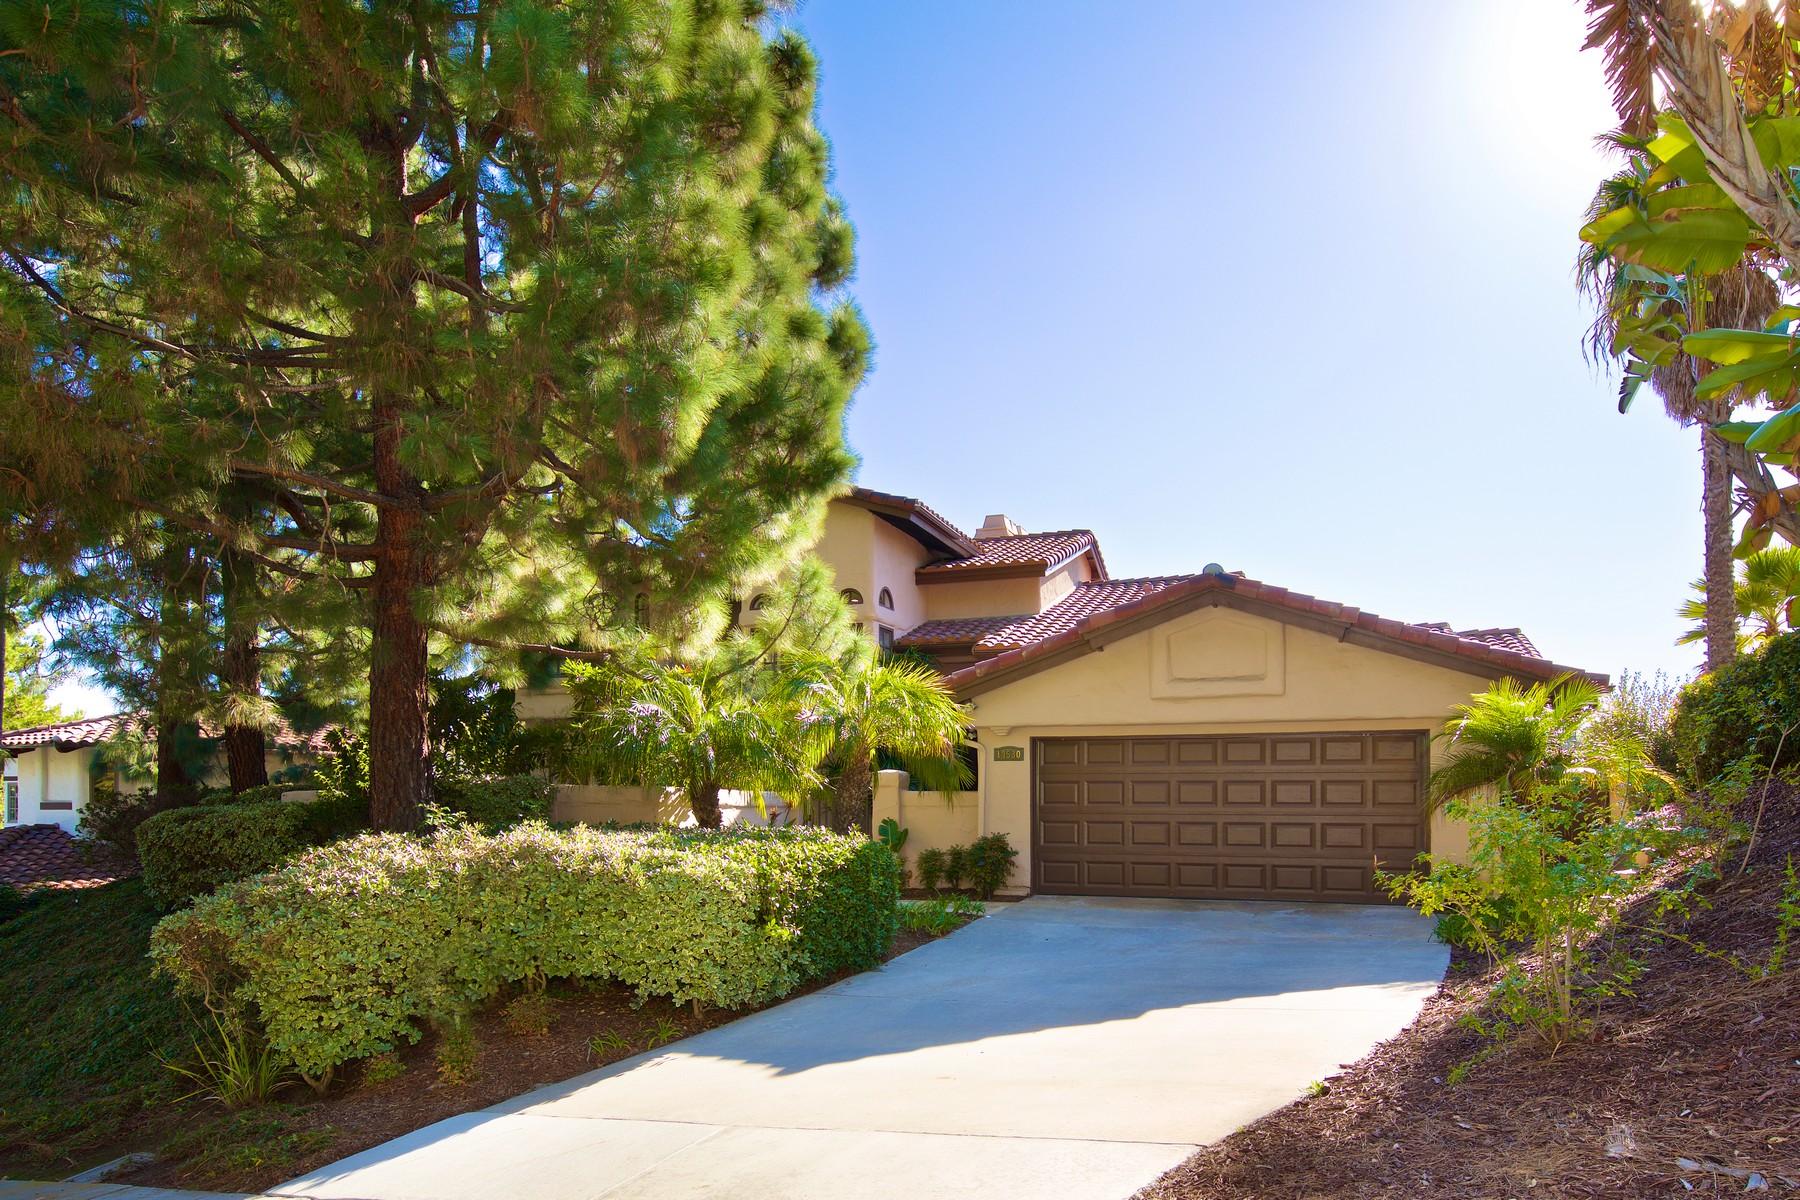 Moradia para Venda às 14530 Caminito Saragossa Rancho Santa Fe, Califórnia, 92067 Estados Unidos